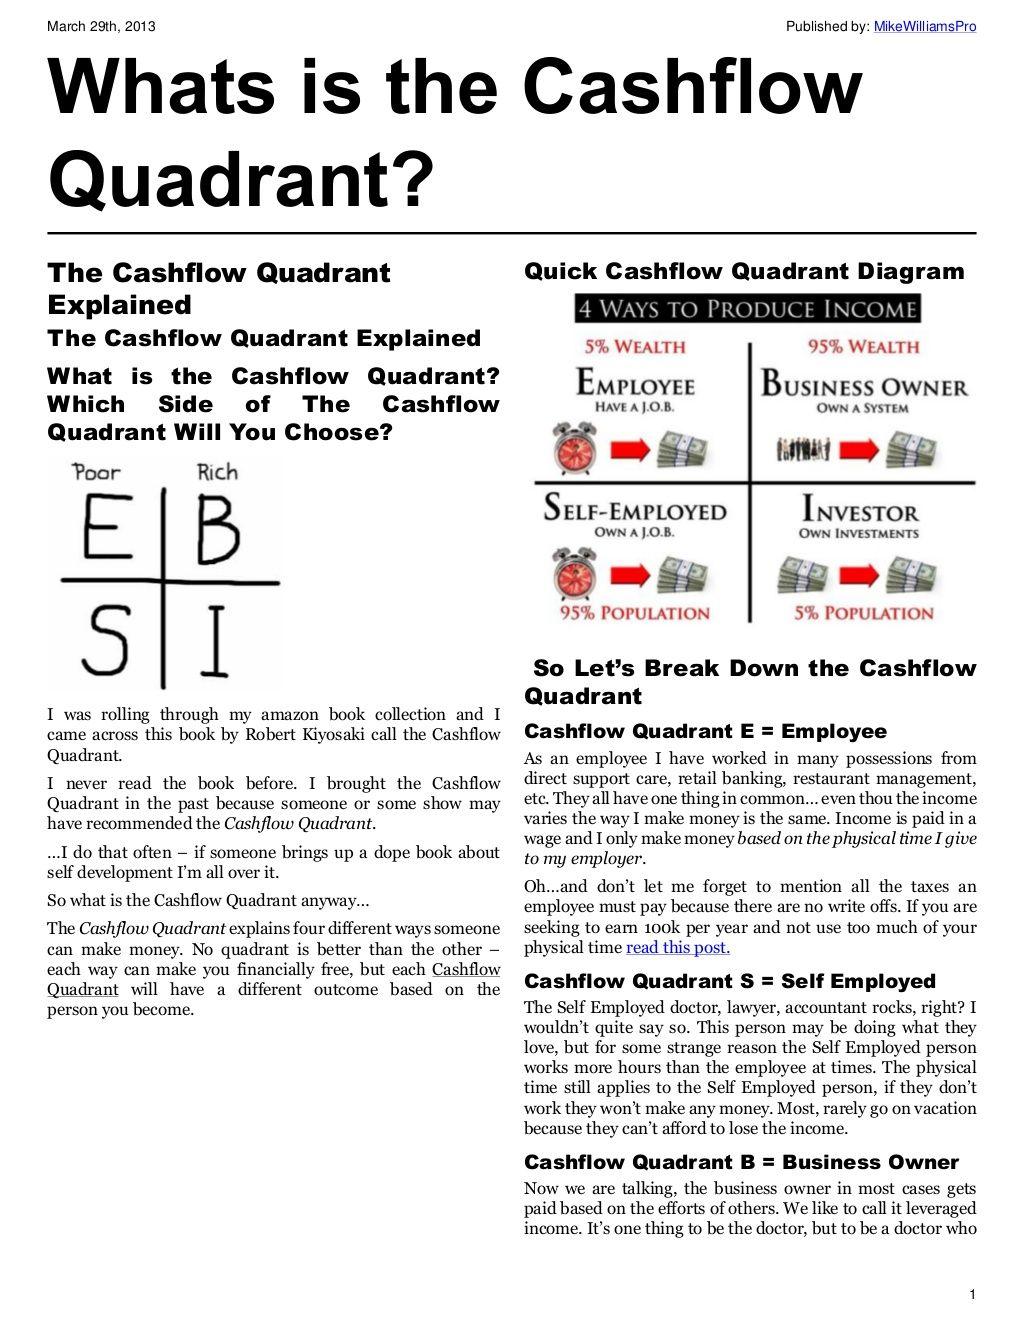 The Cashflow Quadrant Explained By Mike Williams Via